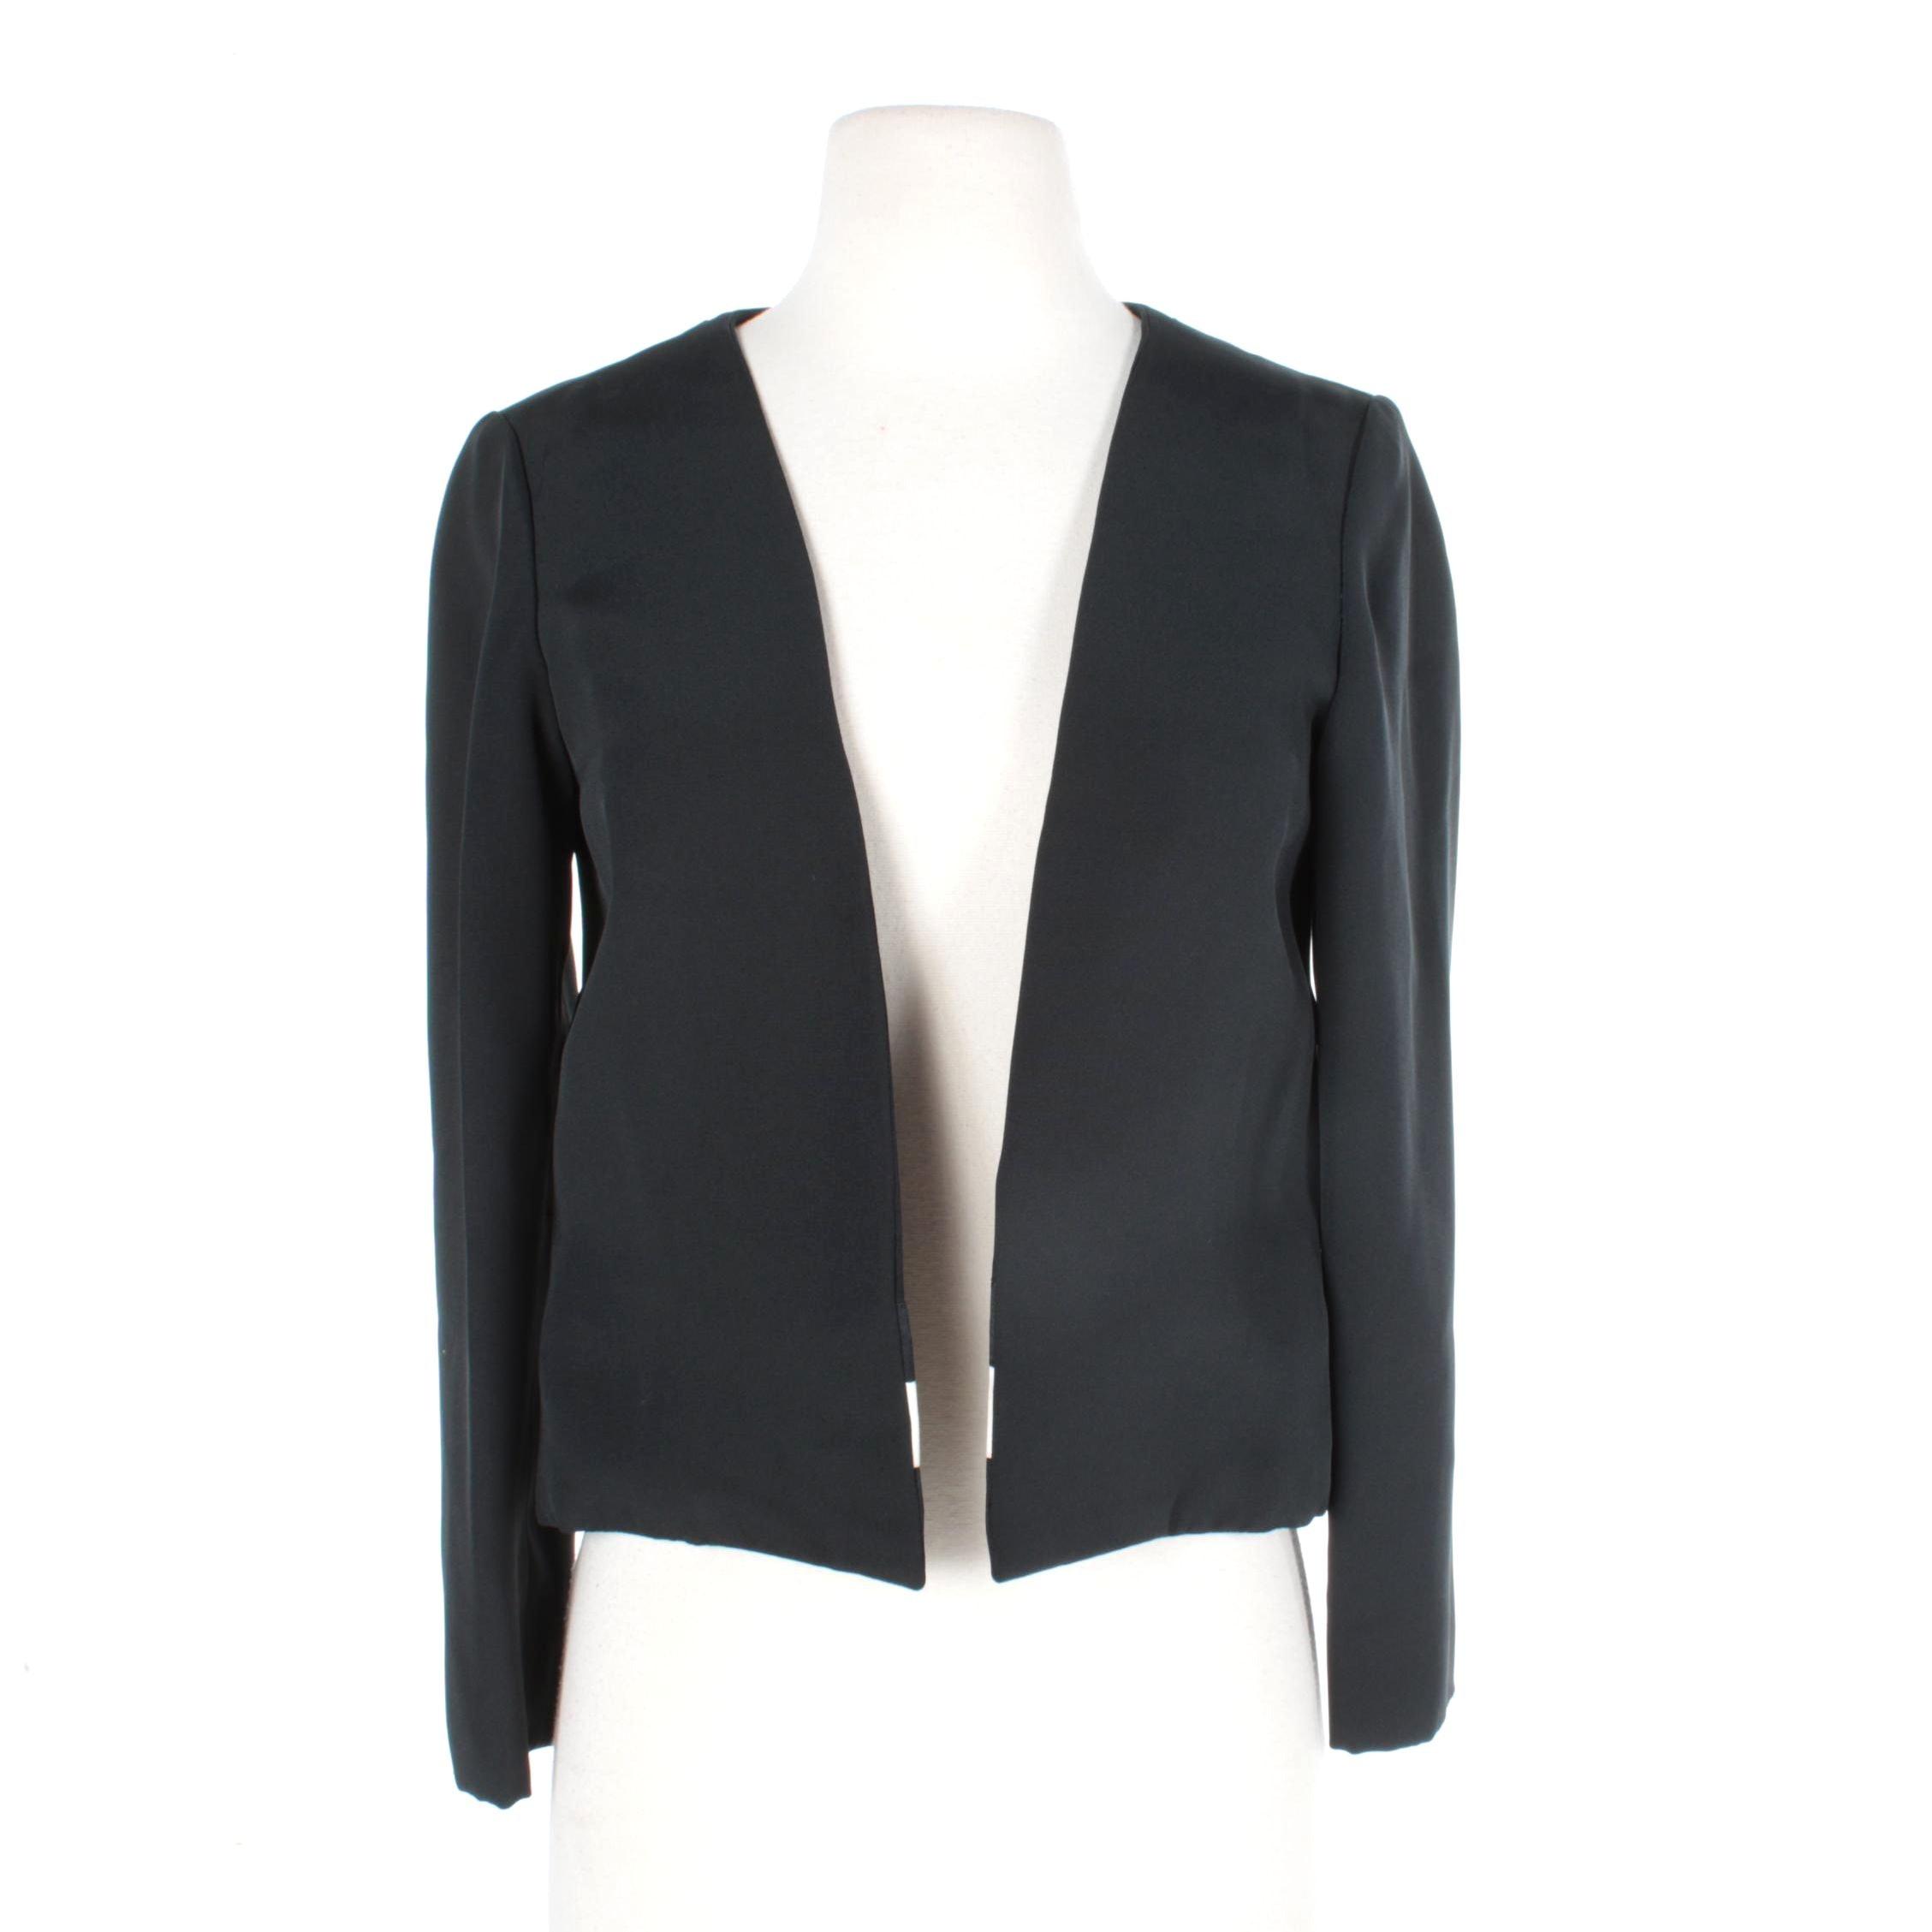 Women's Vintage Cardinali Black Silk Suit Jacket